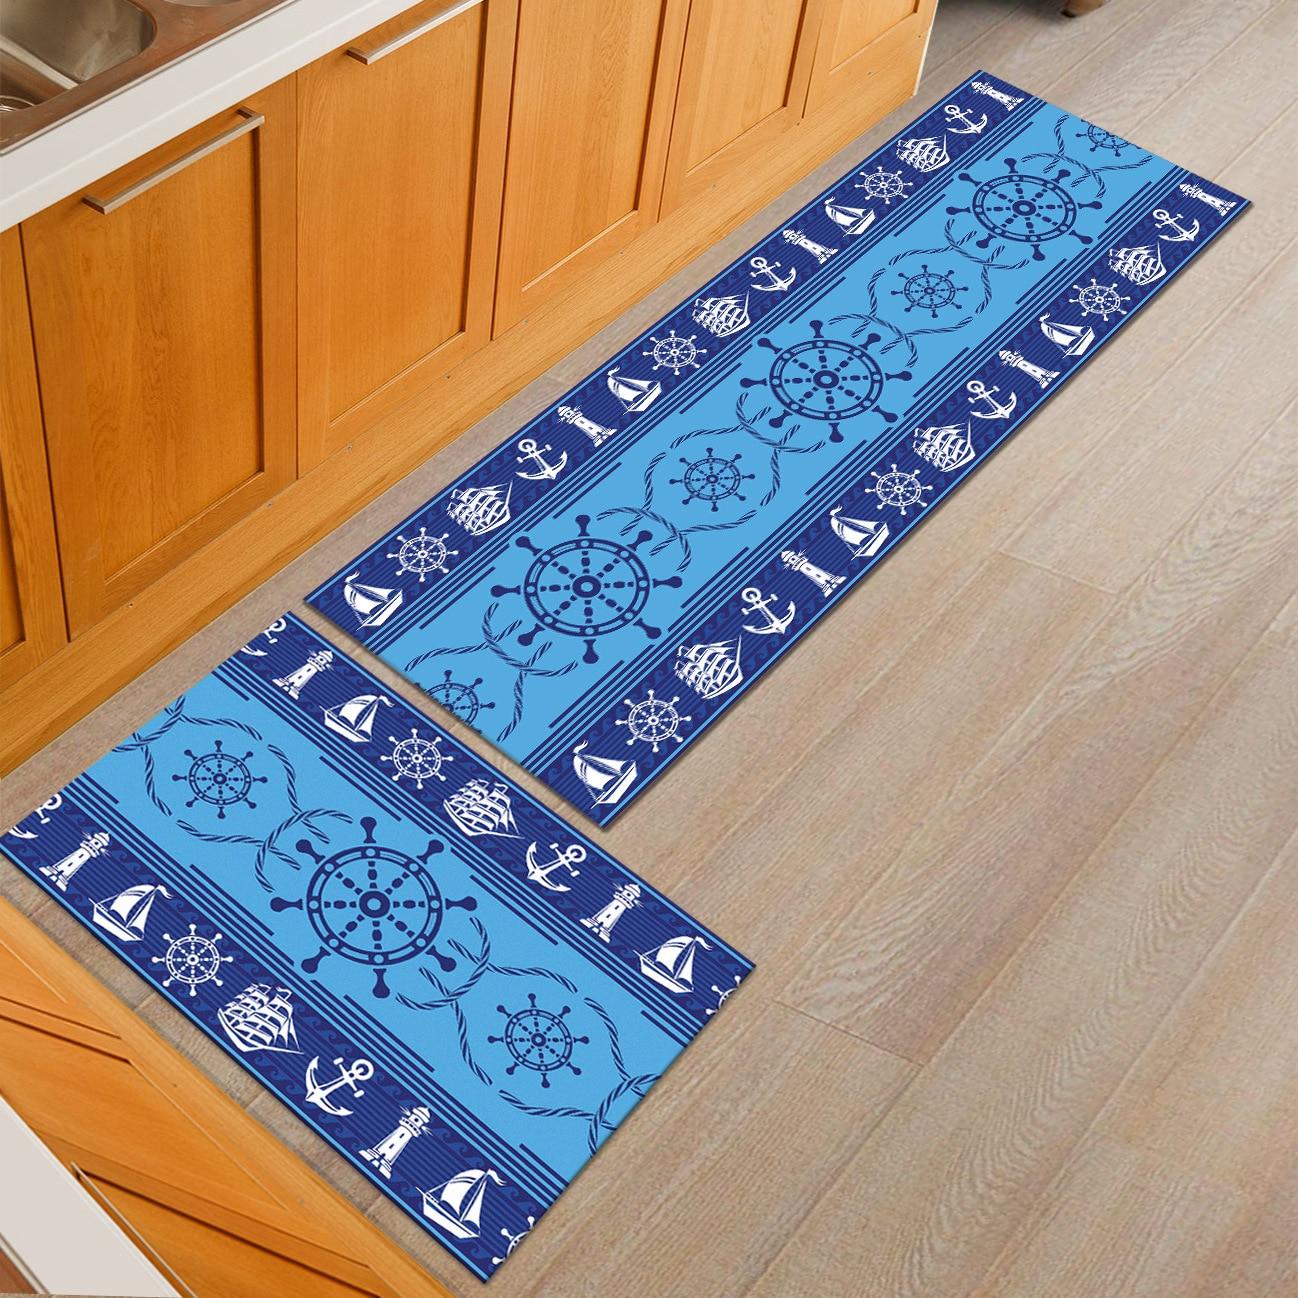 Us 10 41 16 Off Ergonomic Non Toxic Anti Fatigue Kitchen Floor Mat Non Slip Machine Washable Absorbent Floor Rug Extra Long Bathroom Runner Rug In